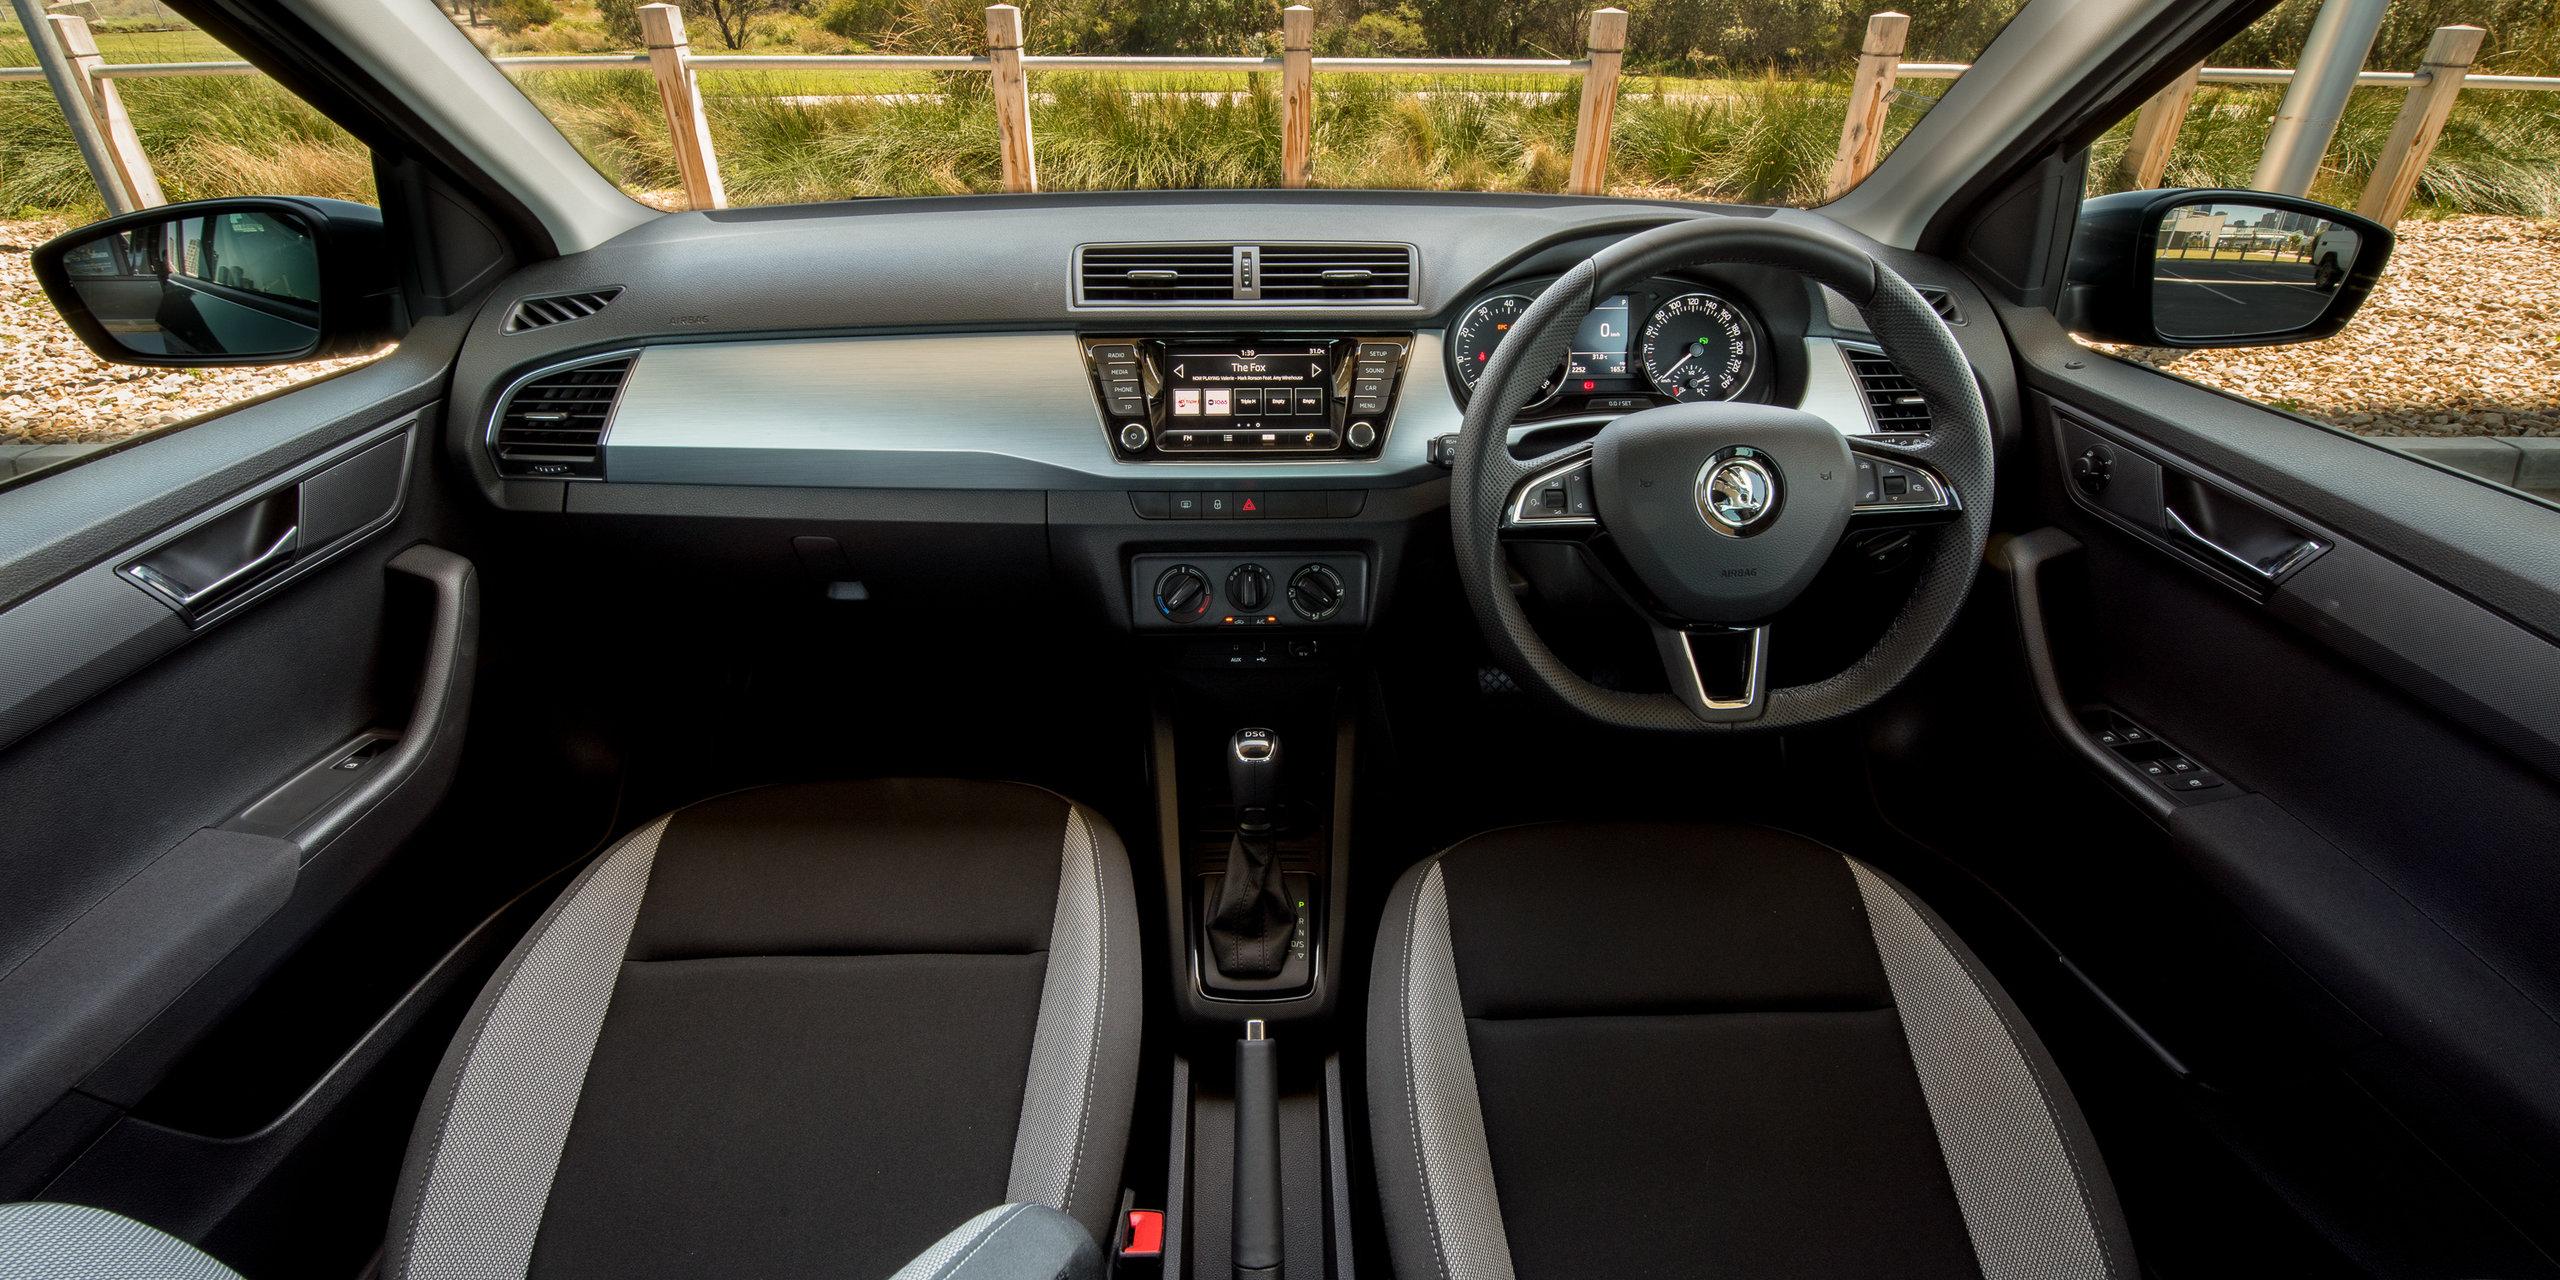 2018 Skoda Fabia 81TSI review | CarAdvice